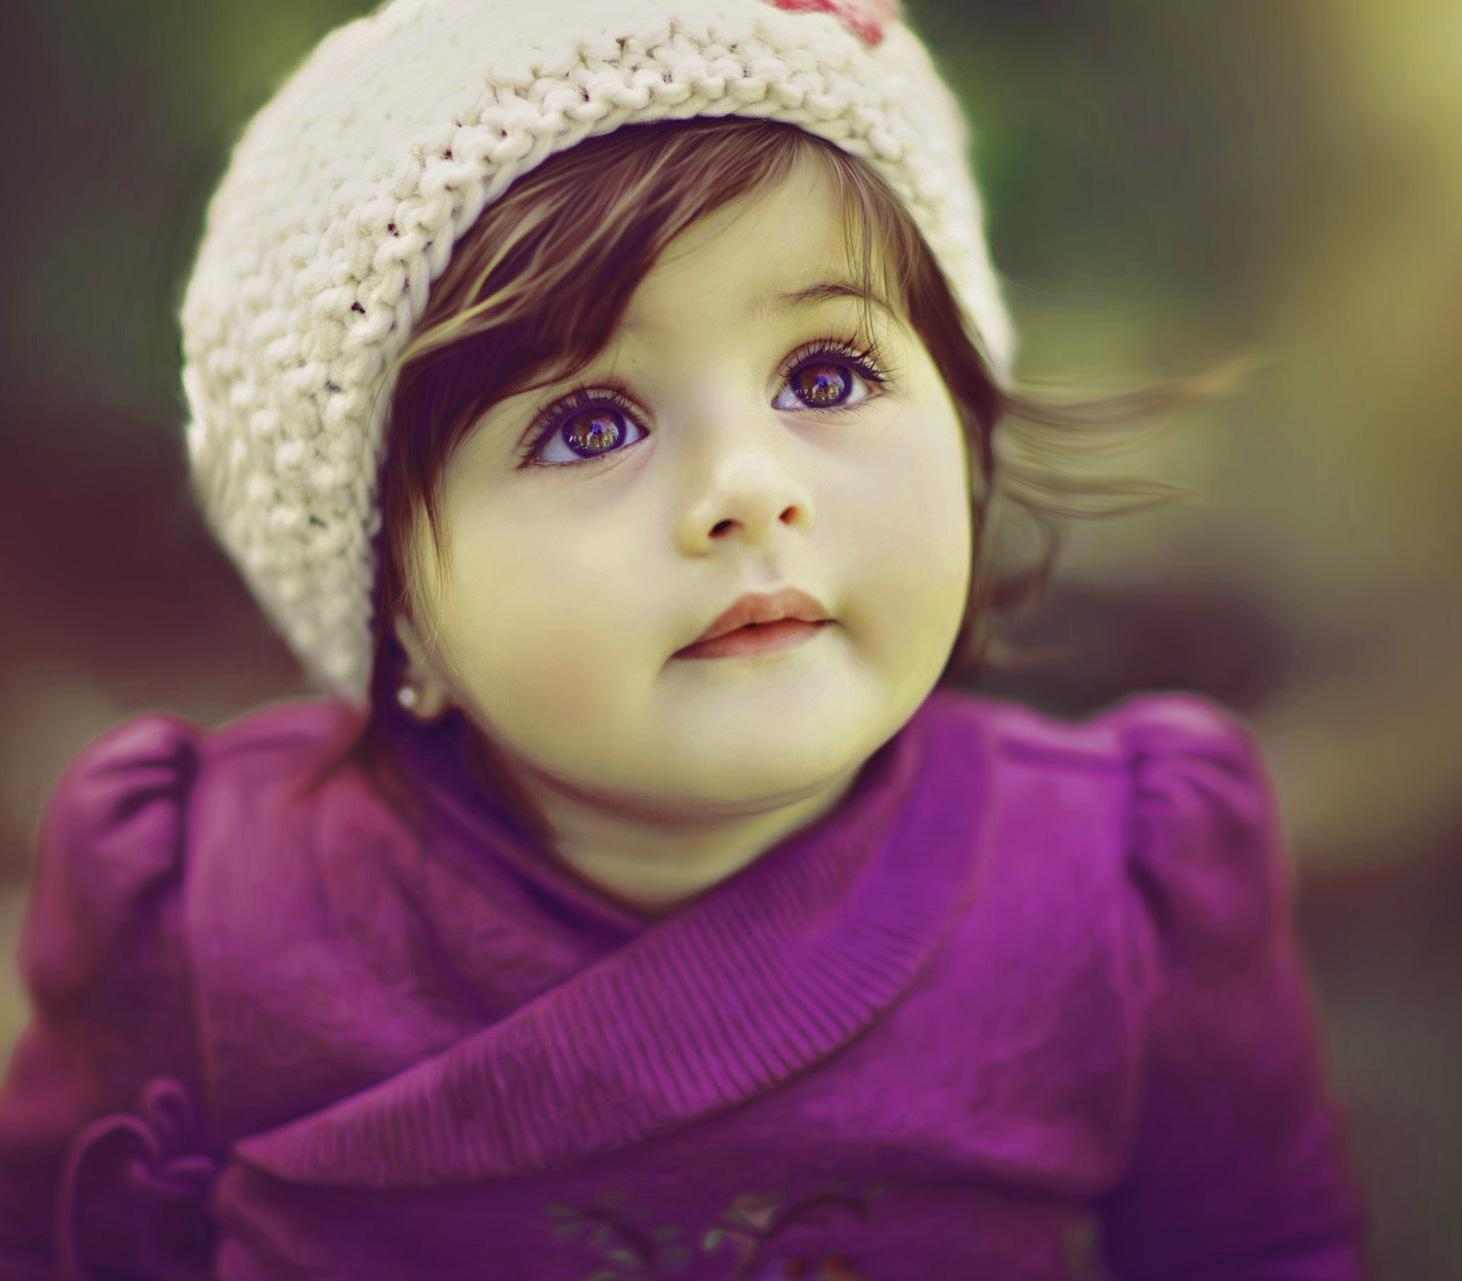 Cute Baby Whatsapp DP Wallpaper Download